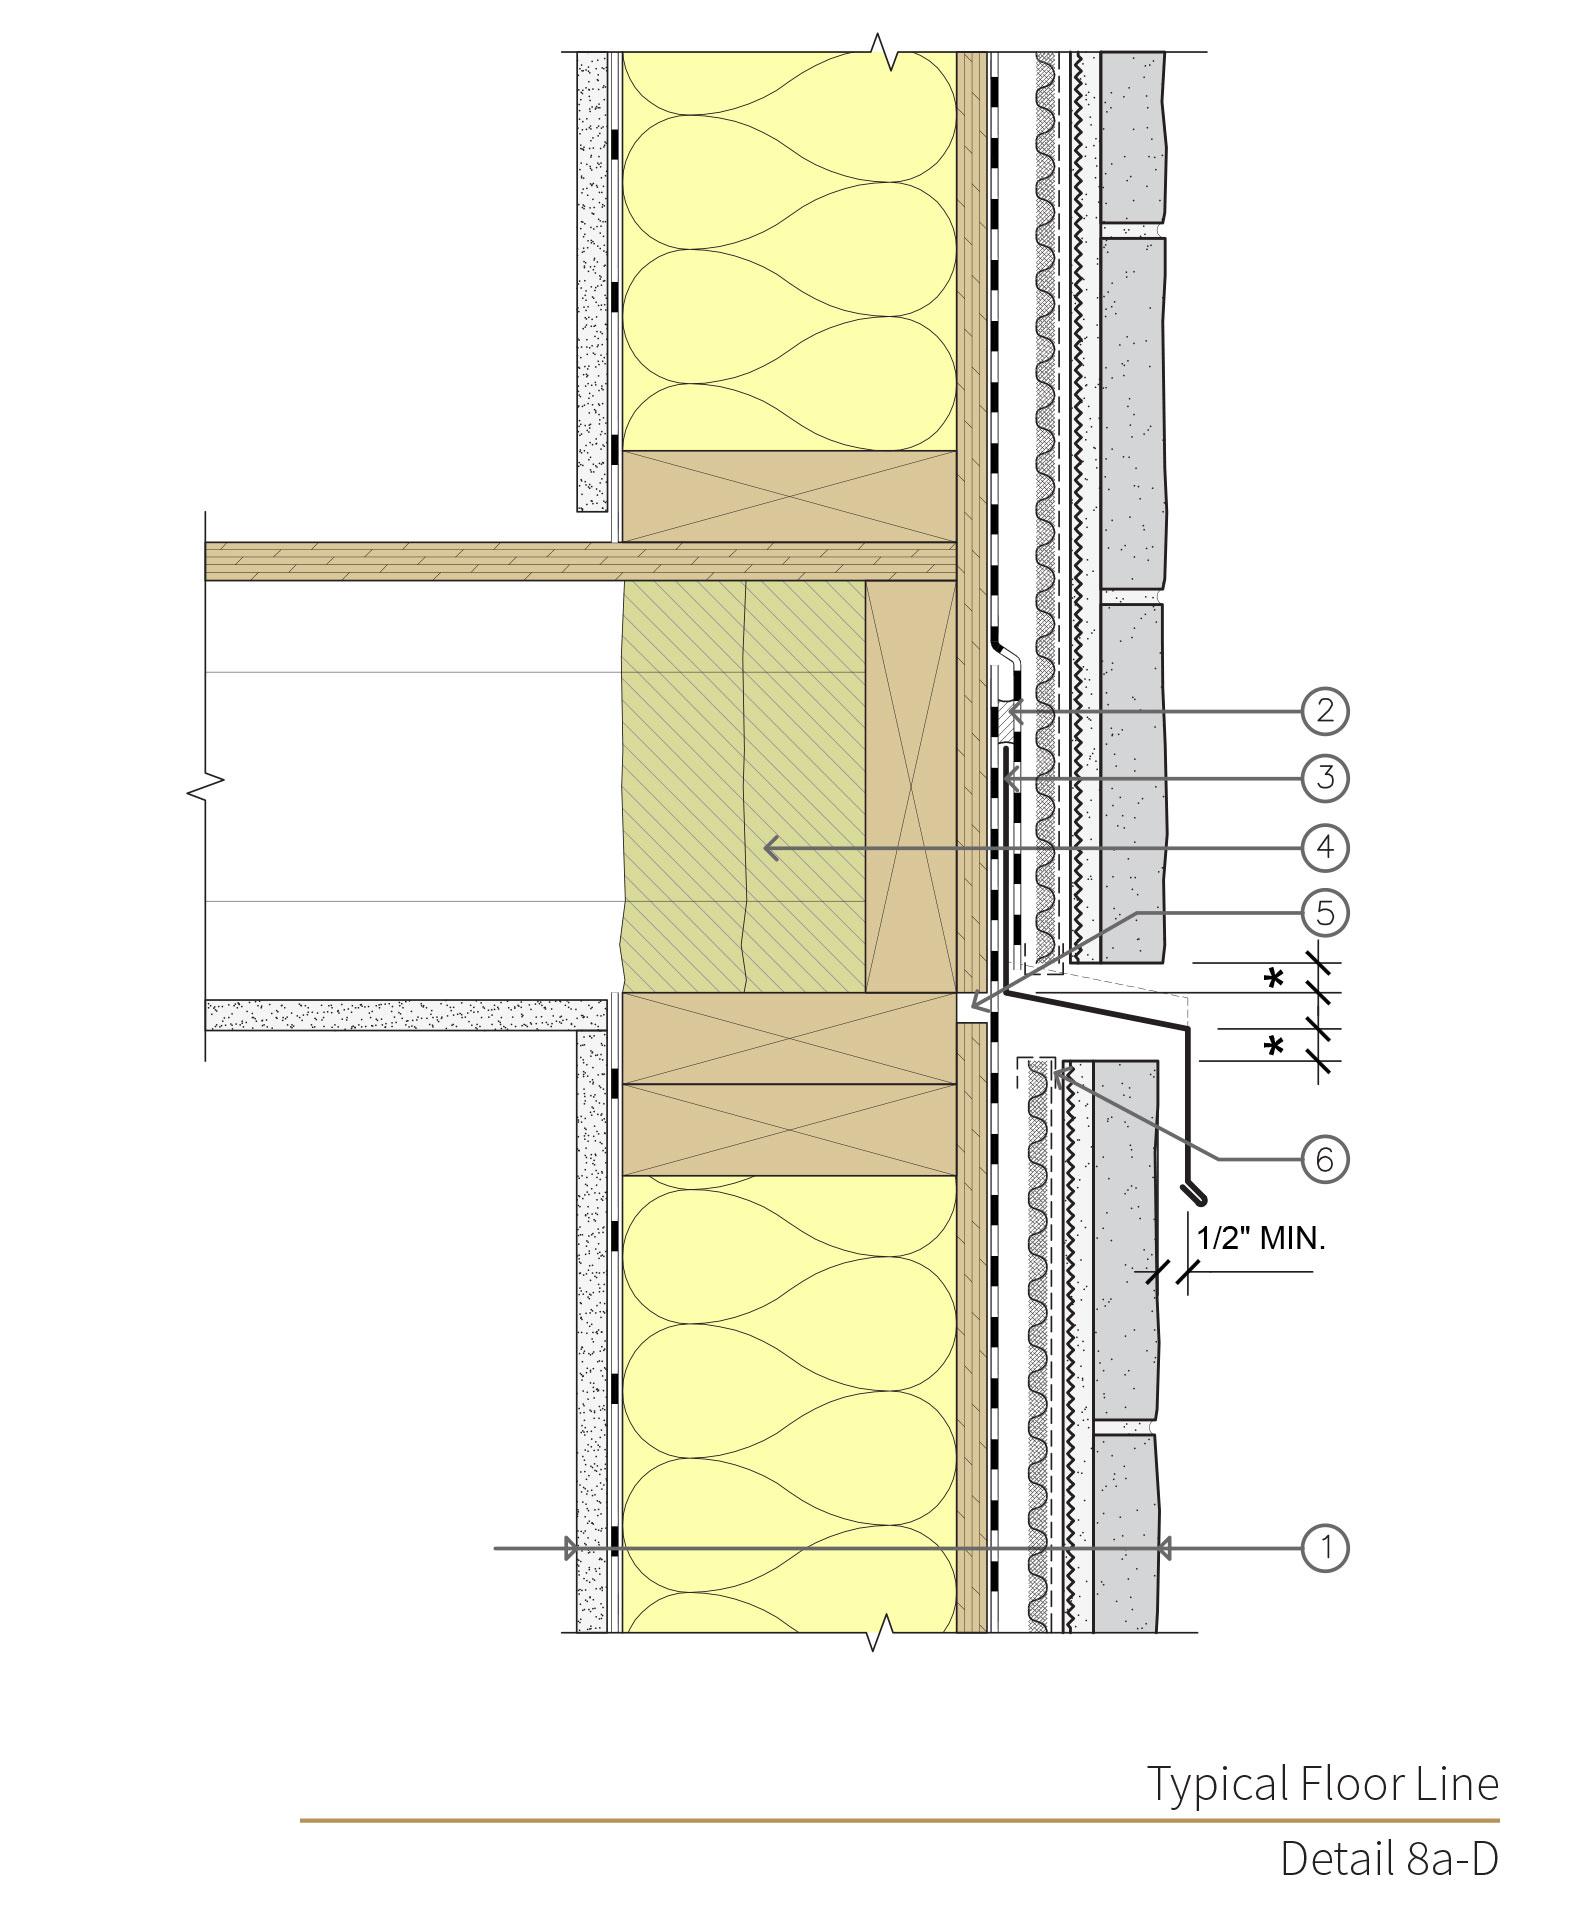 Assembly 8 Detail 8A-D